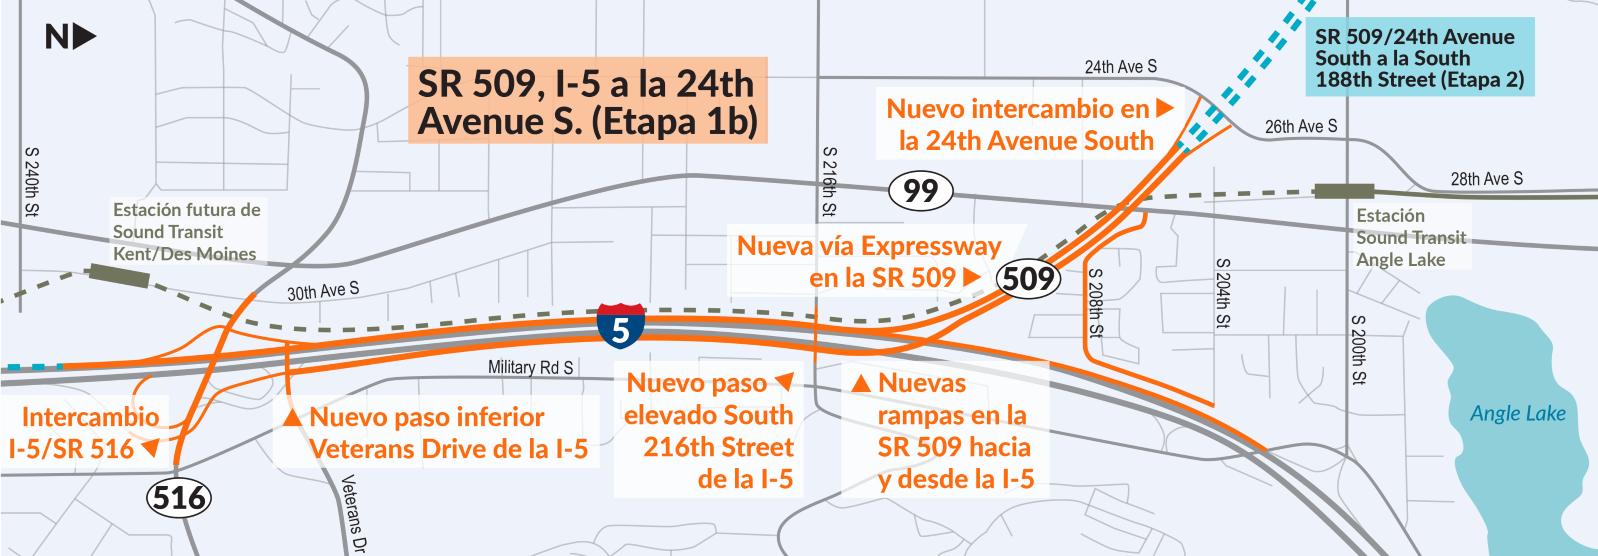 Proyecto de la Vía Expressway - SR 509, I-5 a la 24th Avenue S.